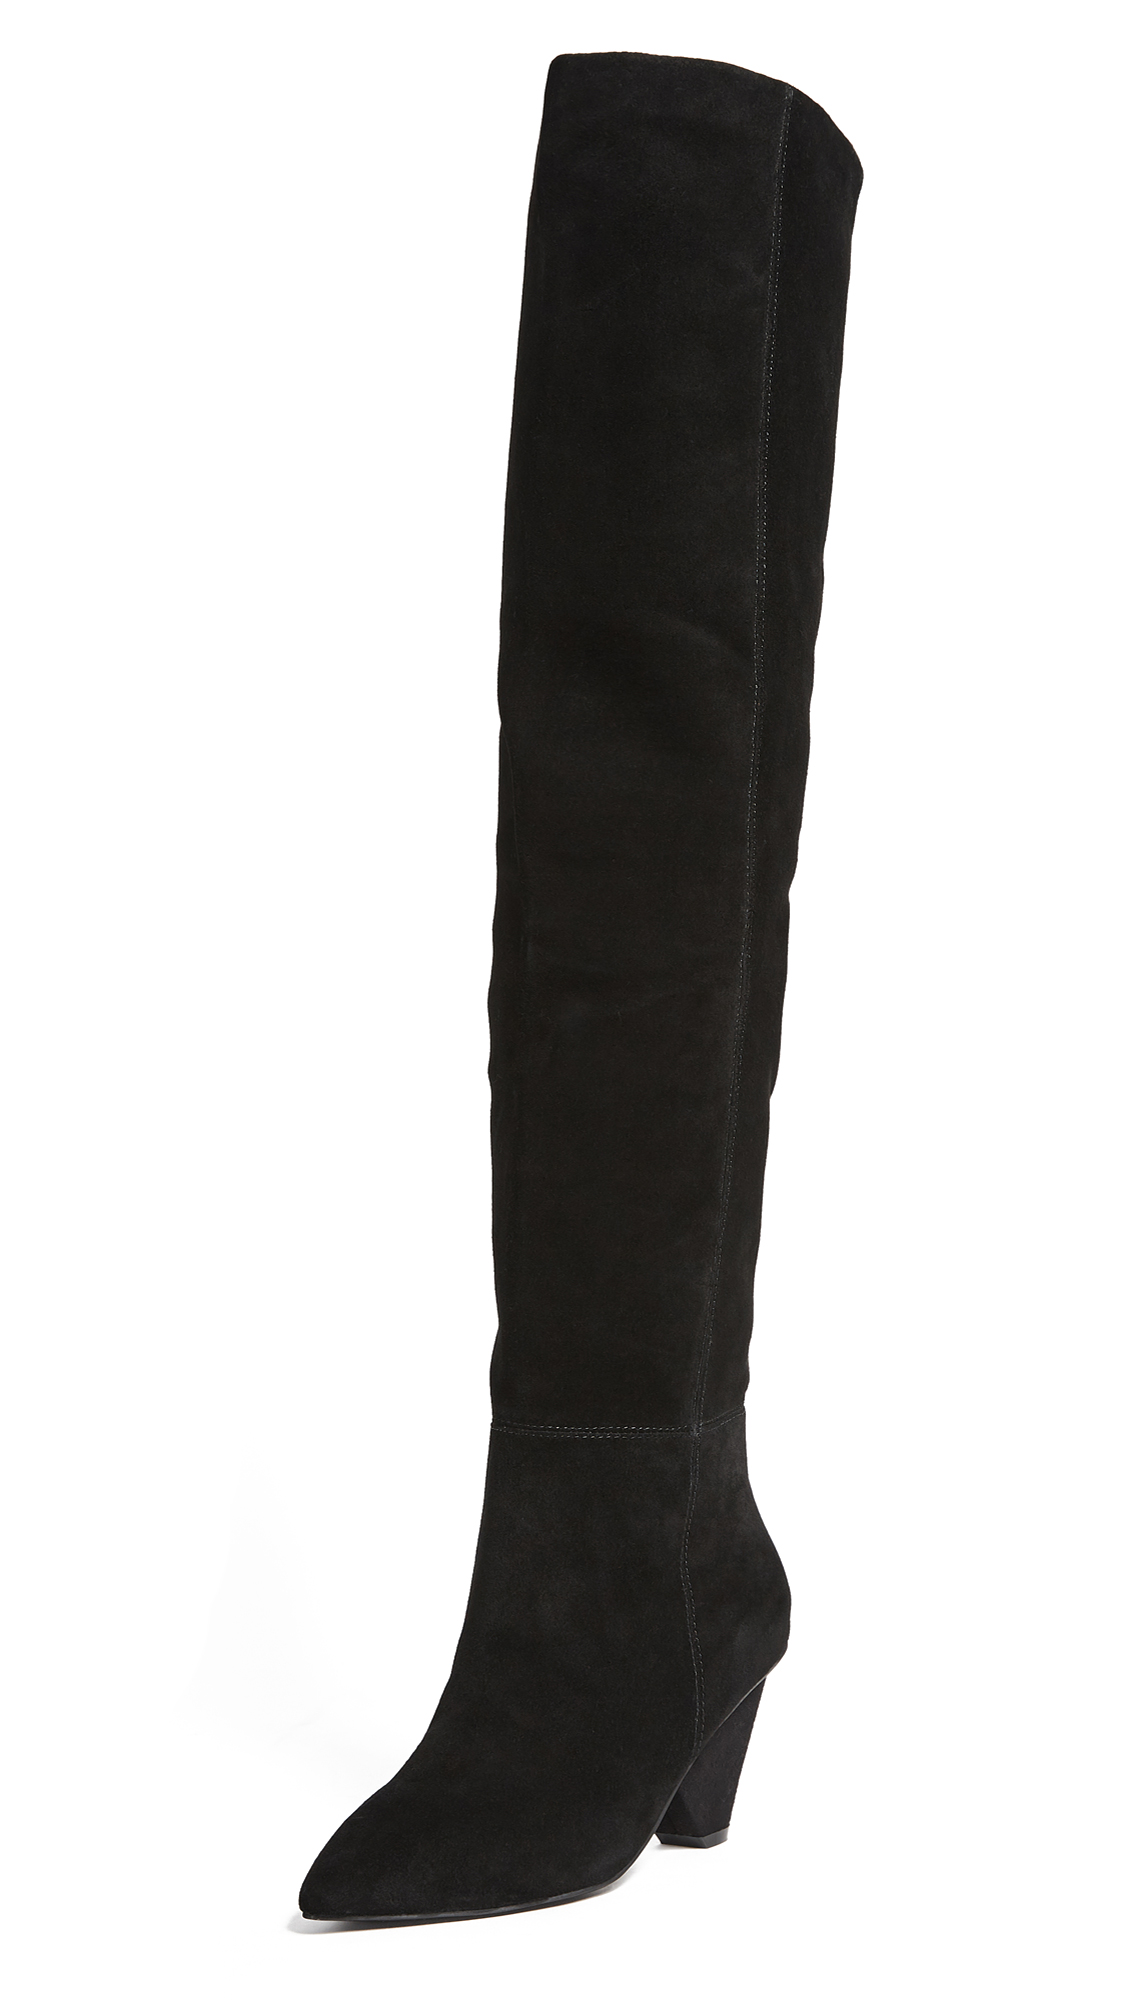 Jeffrey Campbell Senita Cone Heel Boots - Black